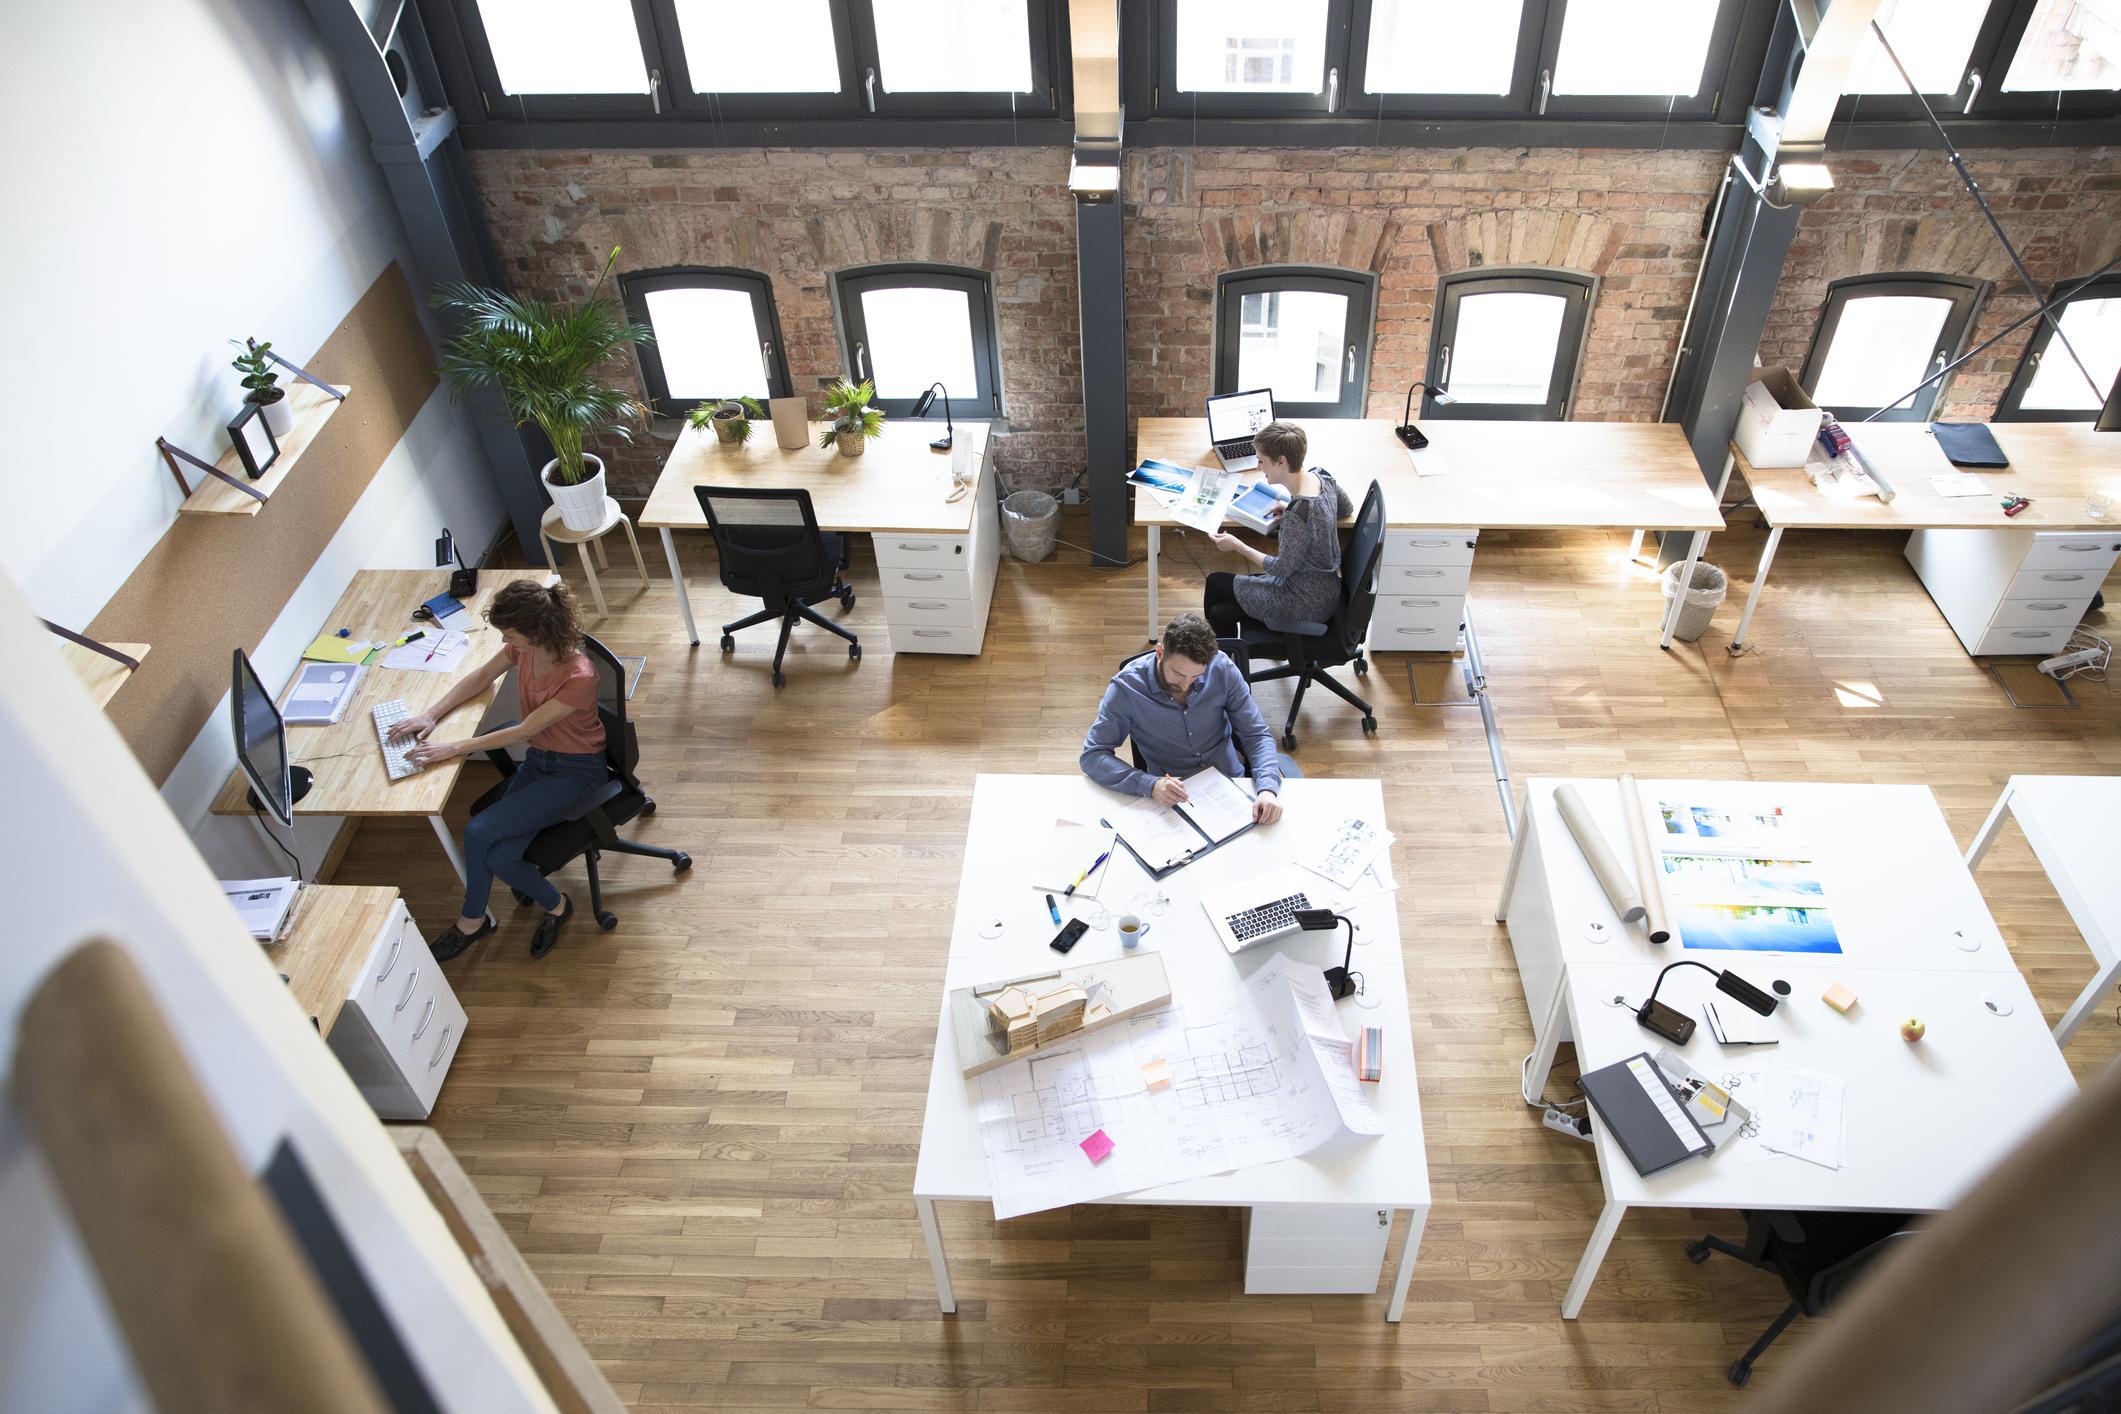 Germany, Berlin, arbeiten im modernen Umfeld, Büro, Kreativität